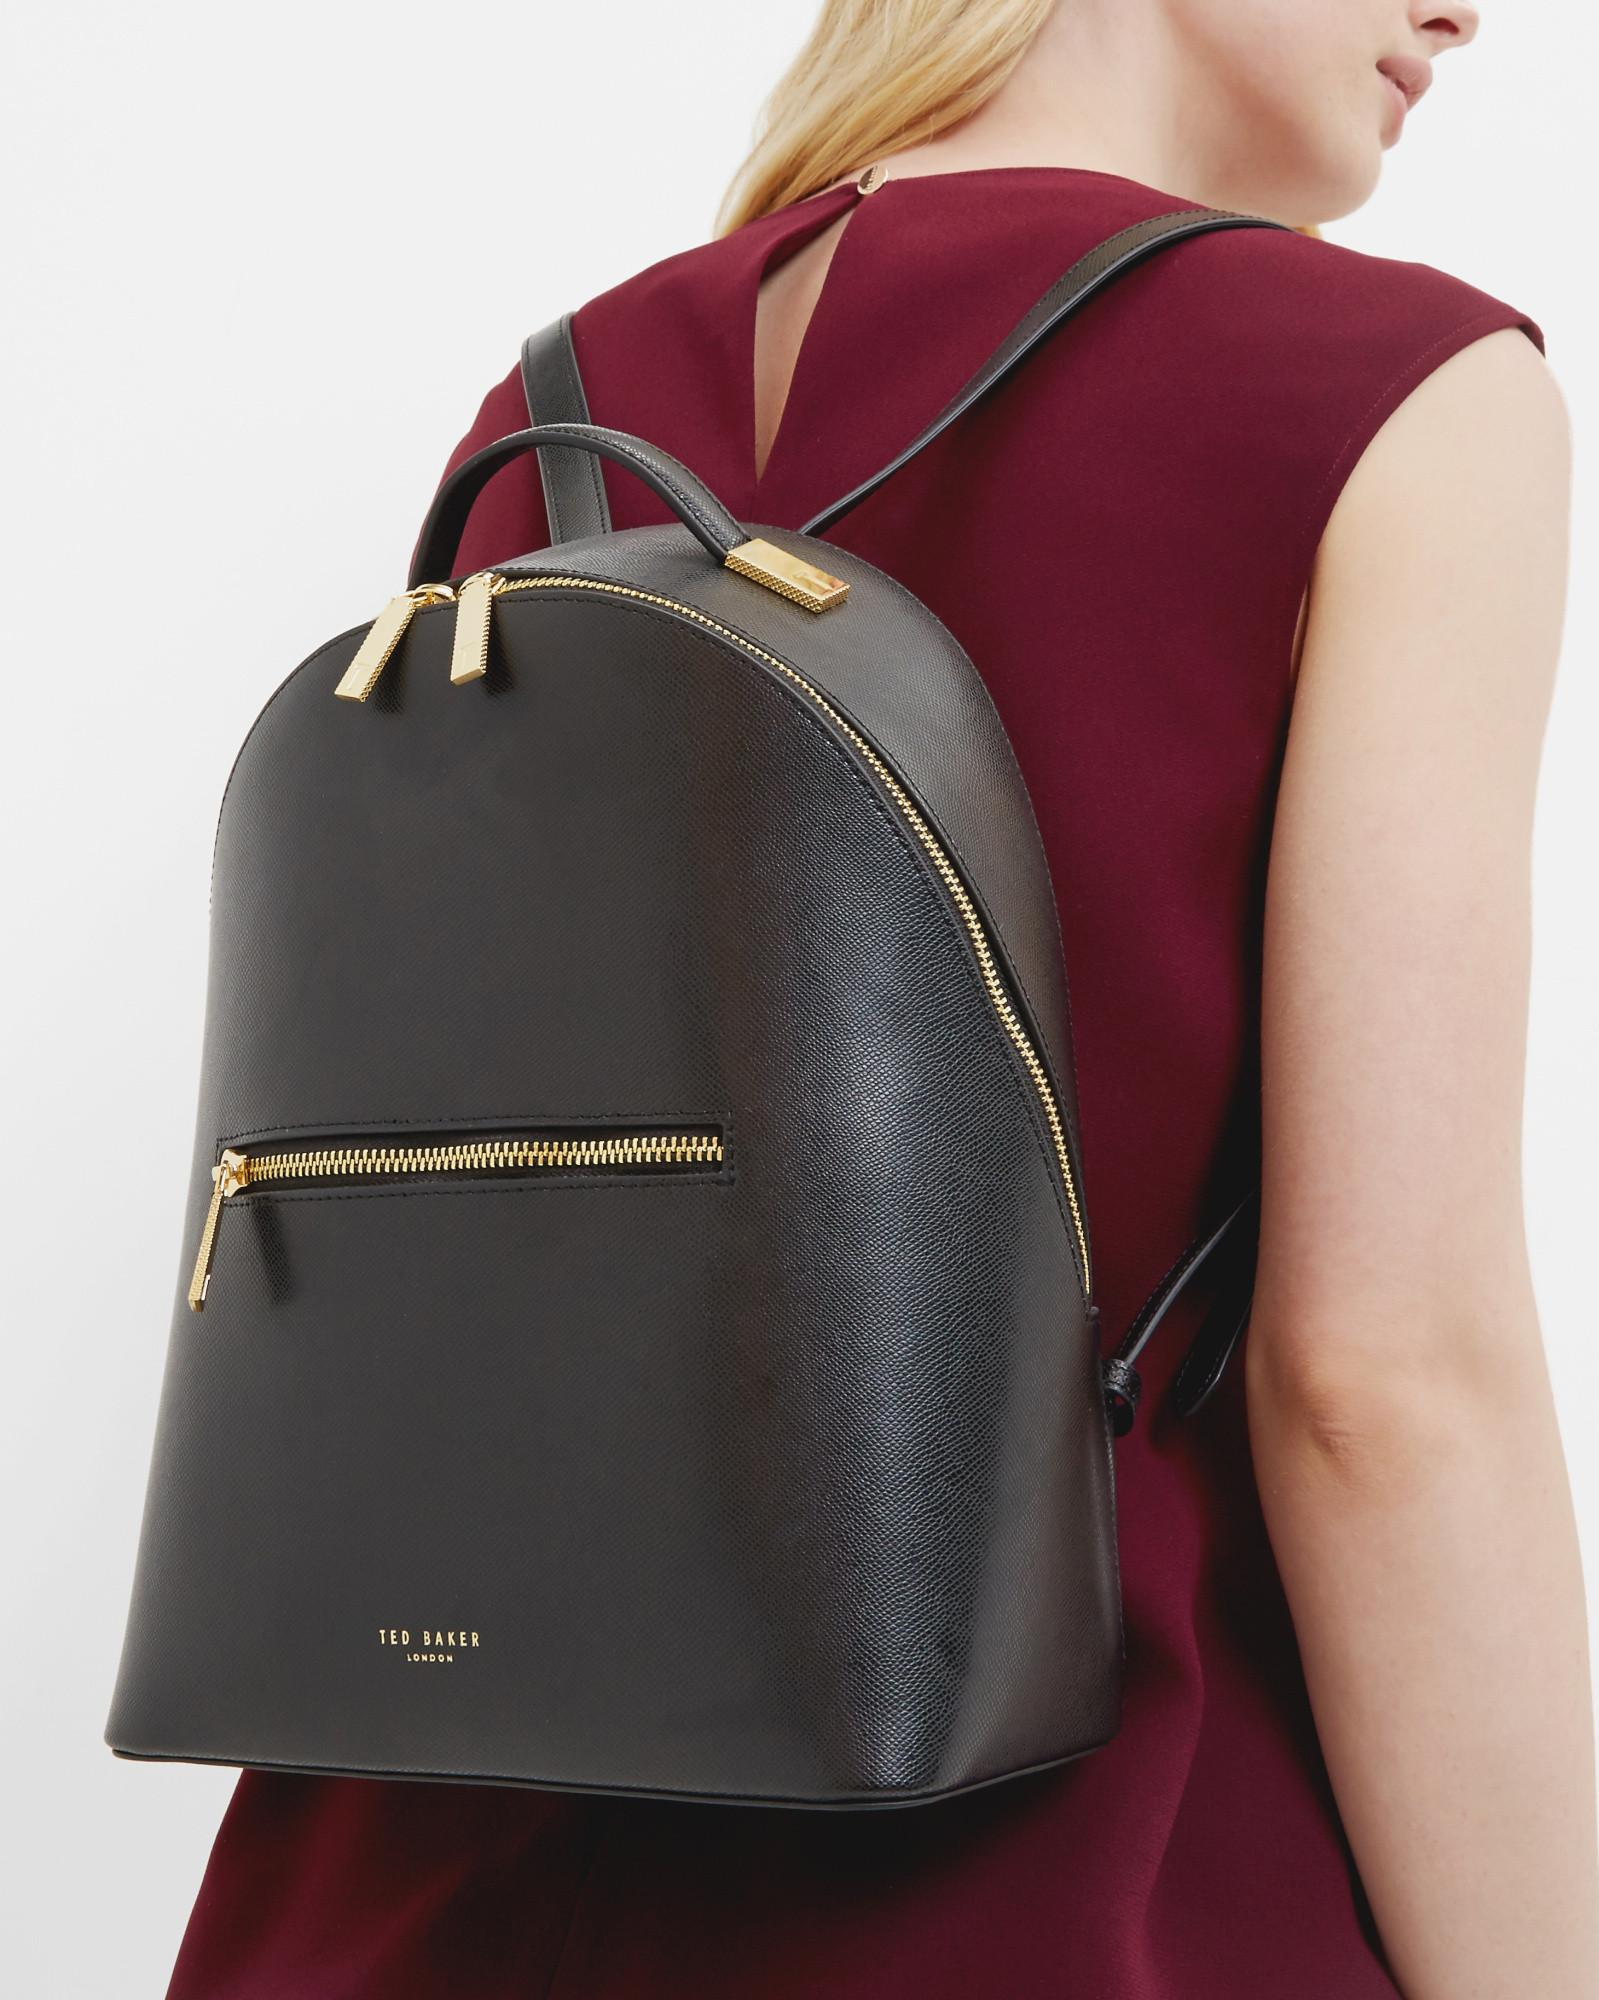 72e1f3280b0b8 ... Lyst - Ted Baker Cross Grain Leather Backpack in Black new arrive 02a22  c8866 ...